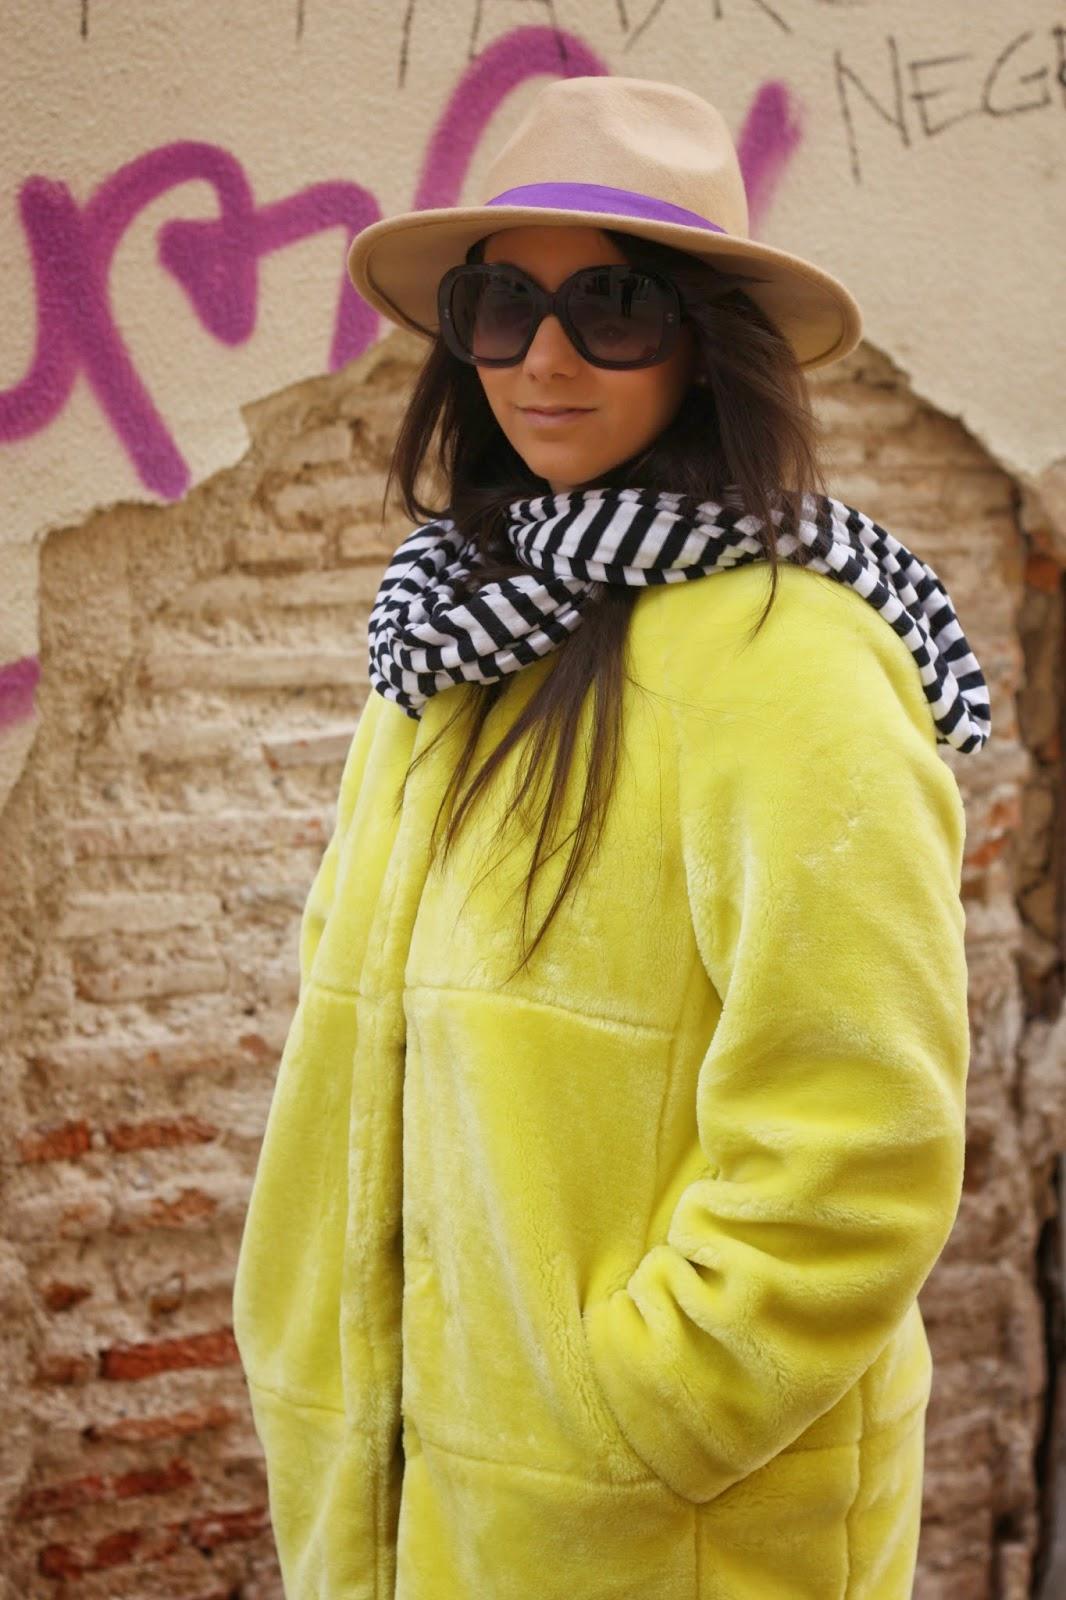 http://silviparalasamigas.blogspot.com.es/2015/03/abrigo-amarillo-zara.html